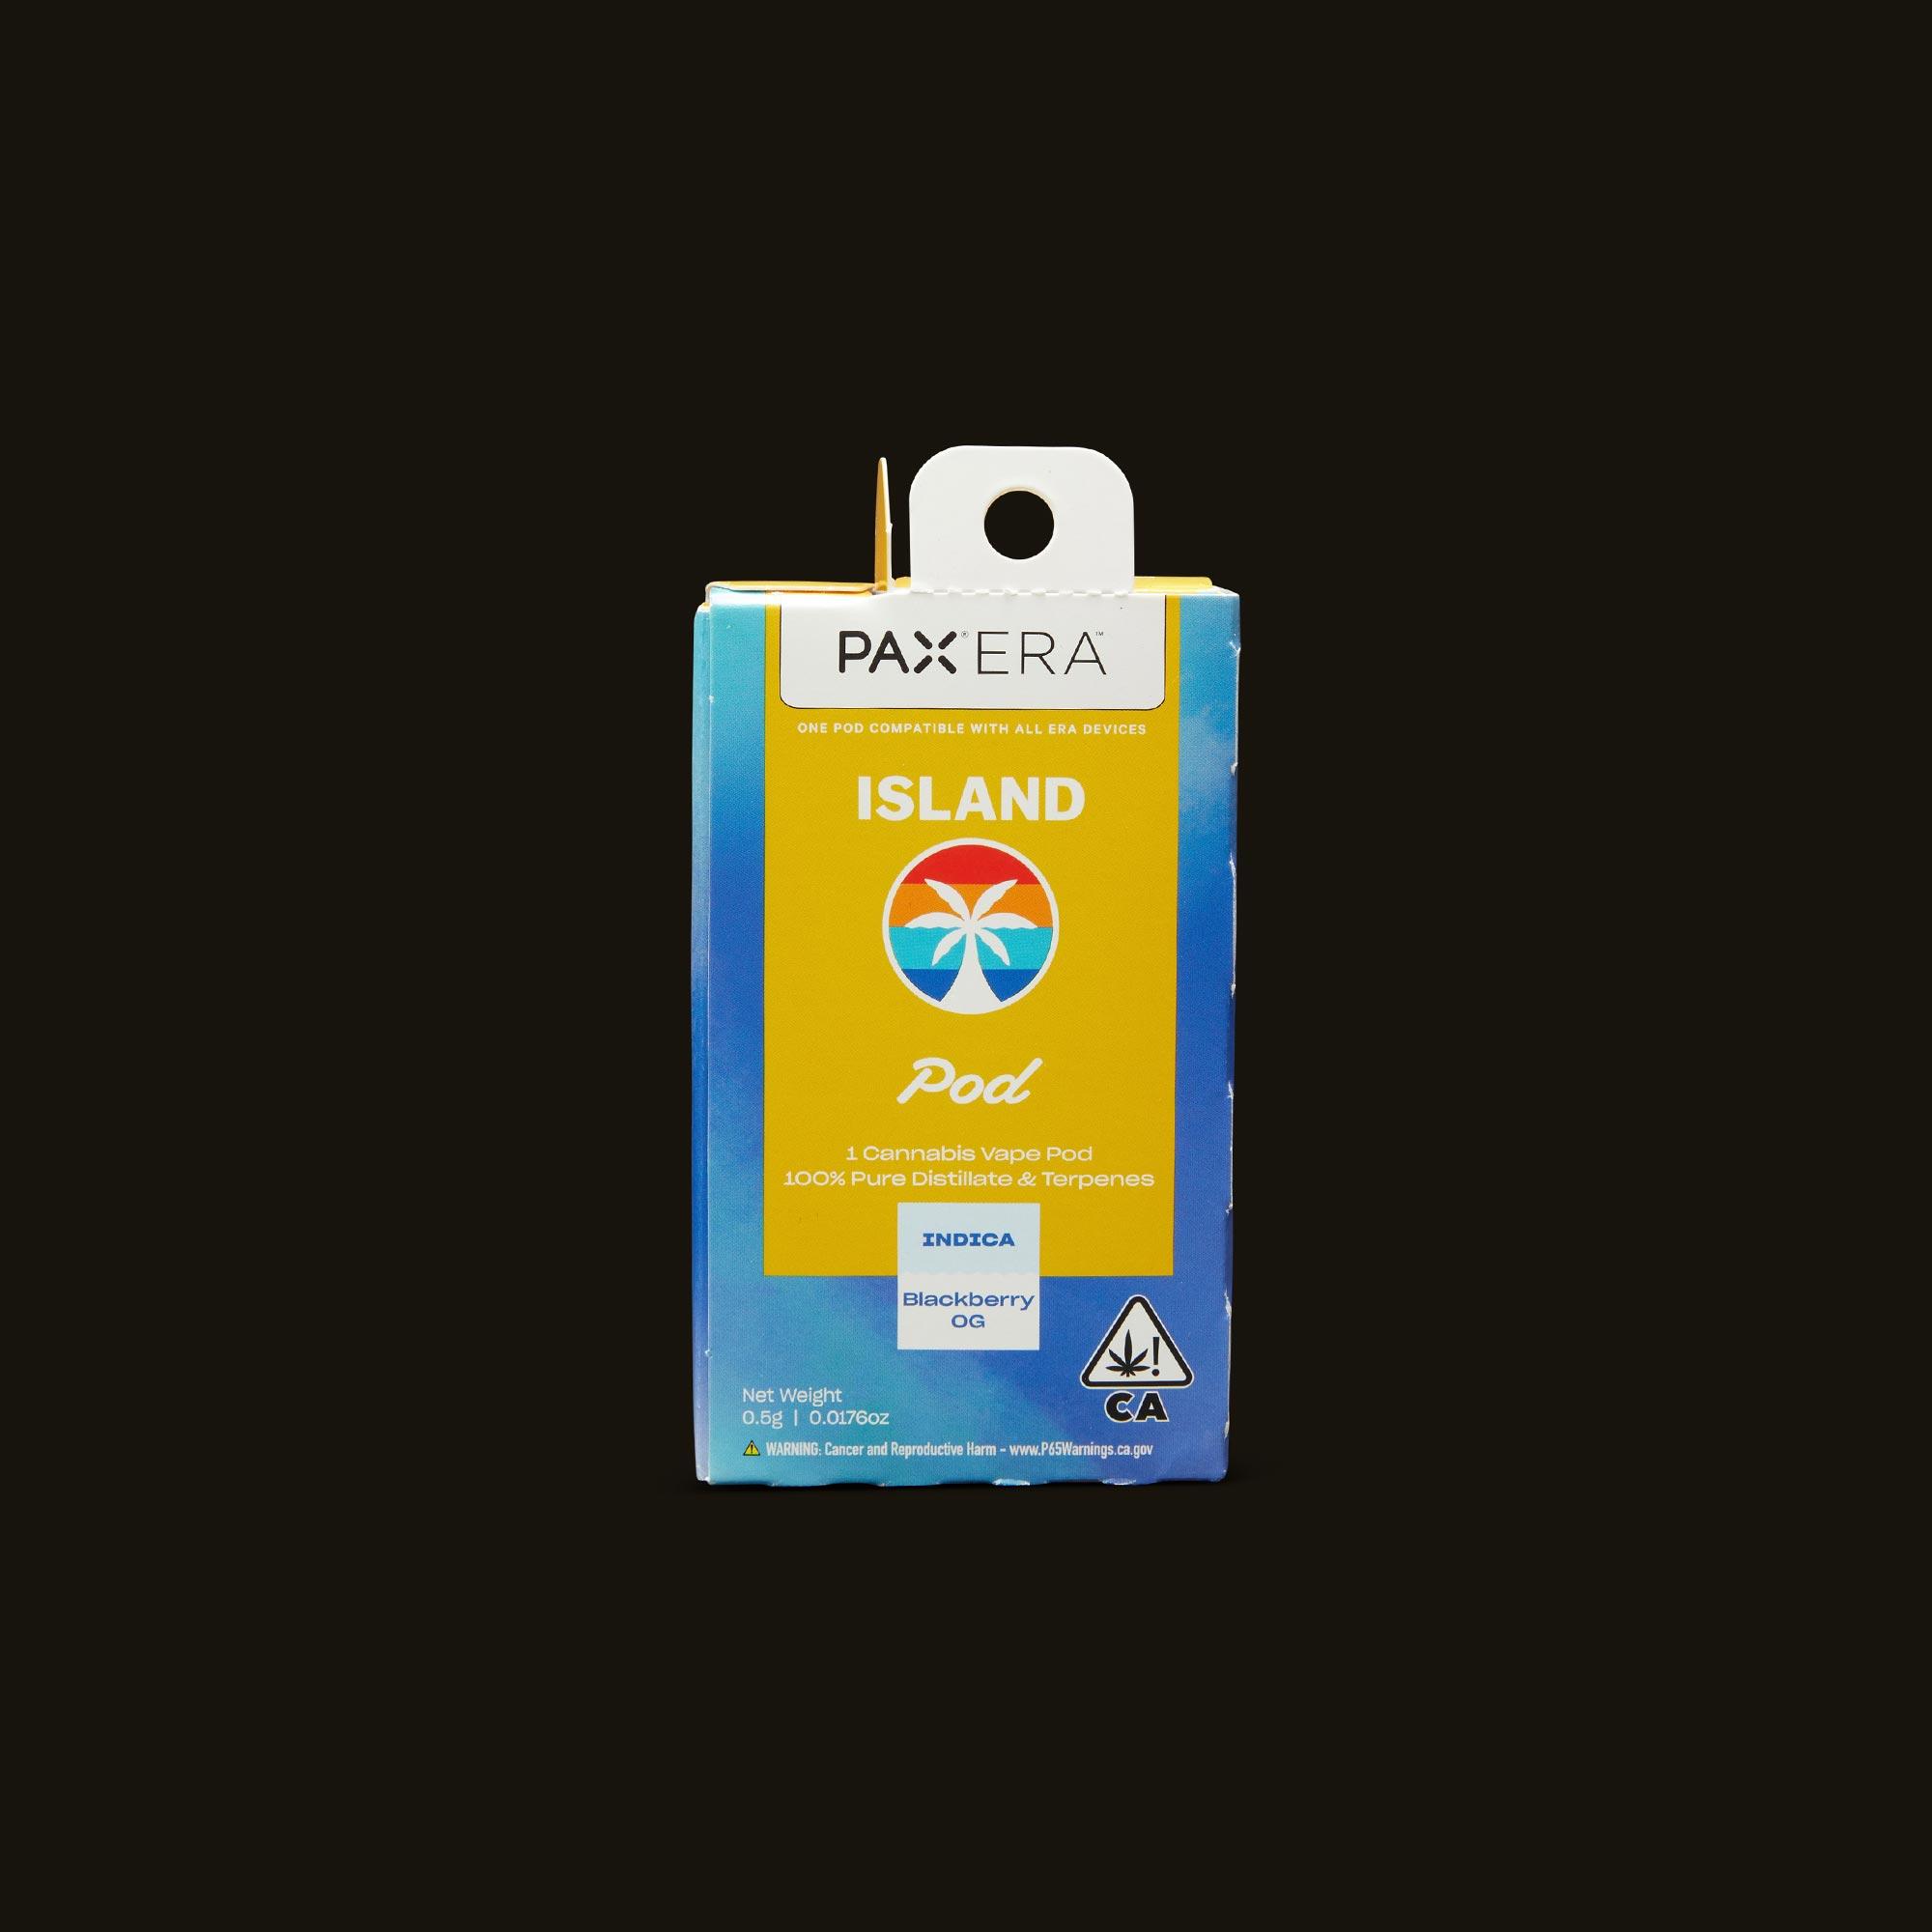 Island Blackberry OG PAX Era Pod Front Packaging